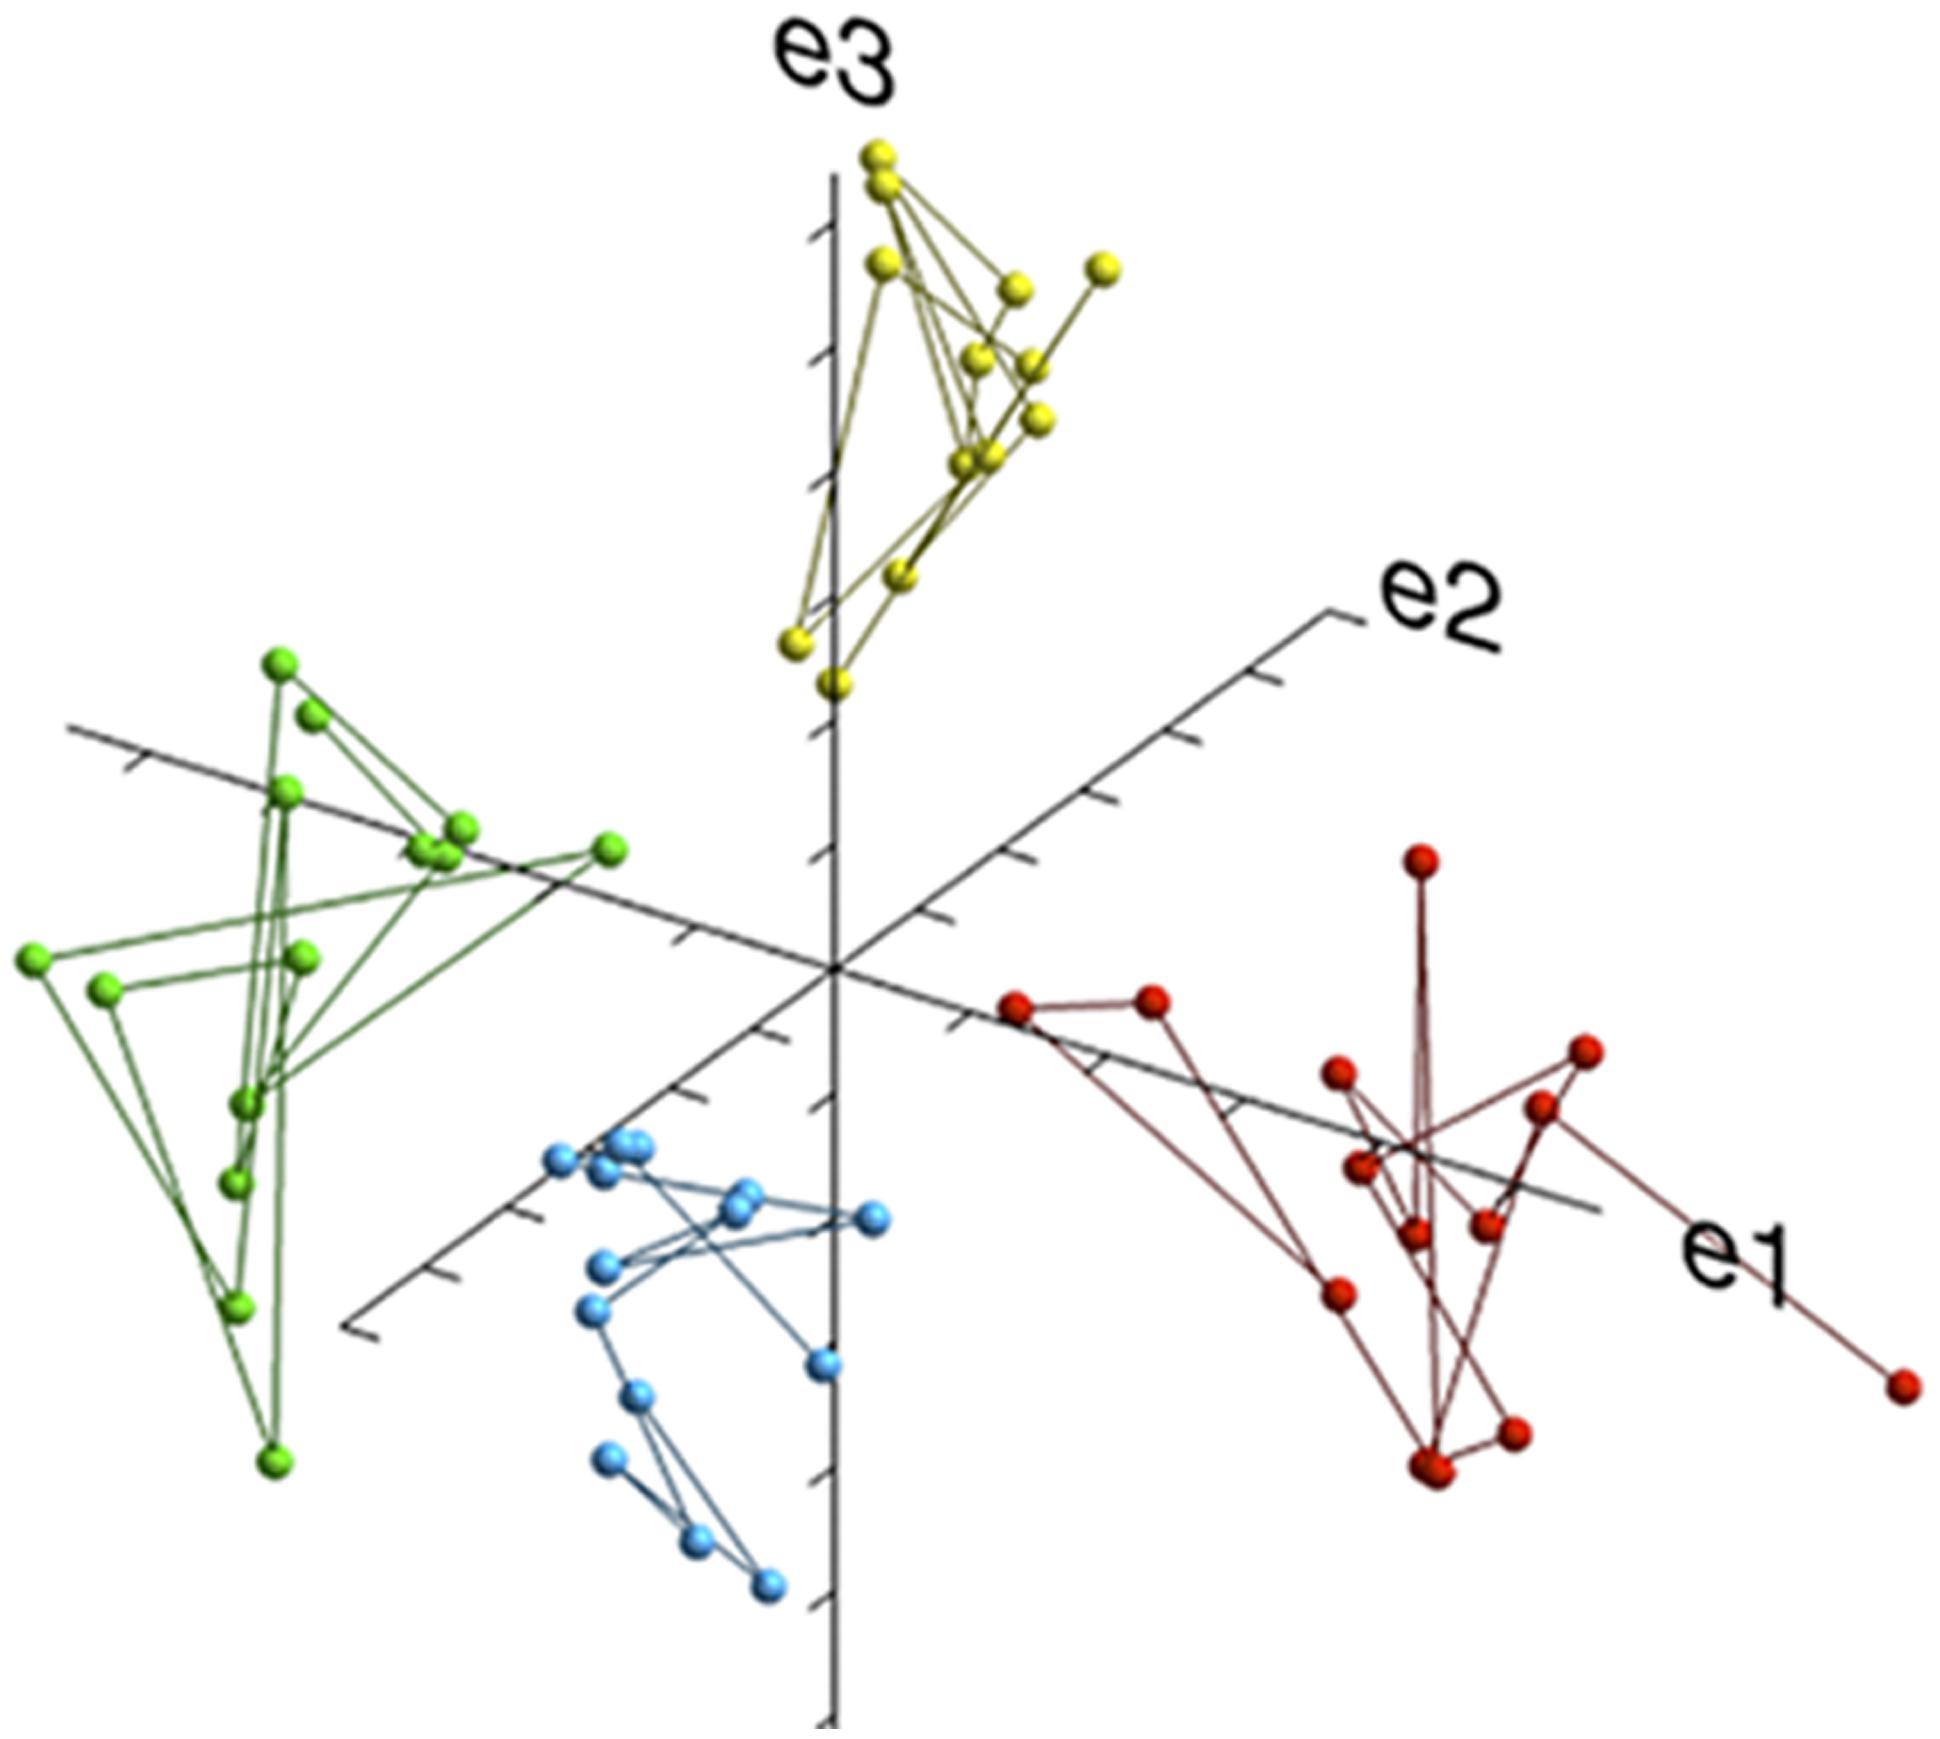 Frontiers | Four broad temperament dimensions: description